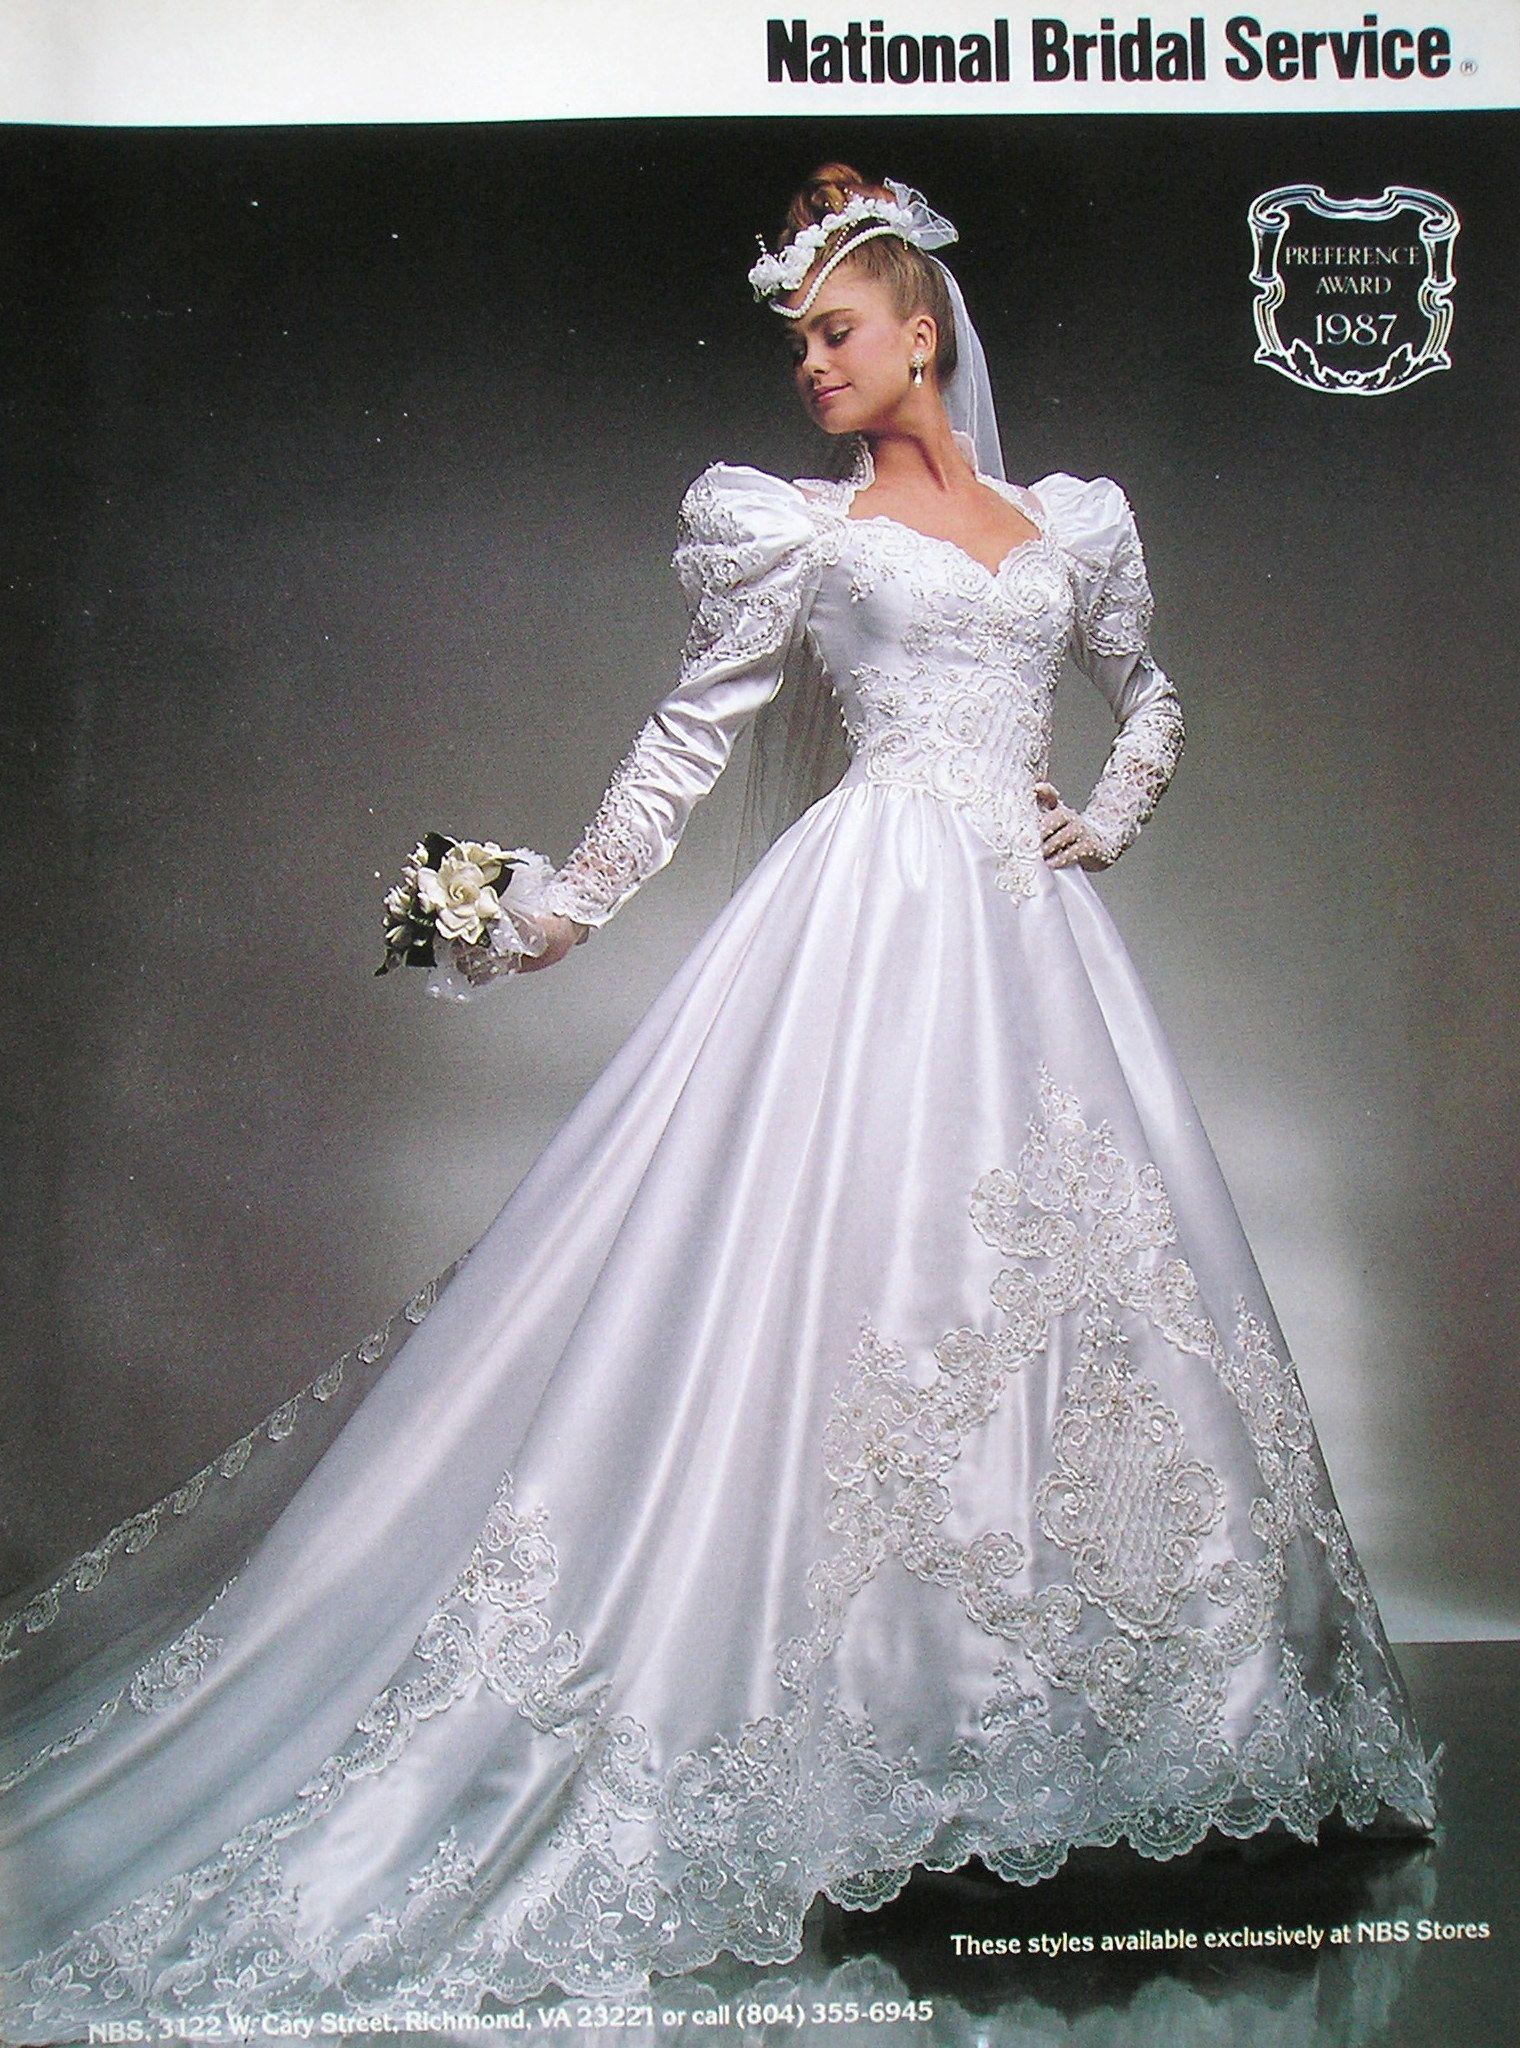 1987 Kathy Ireland (With images) Wedding dresses 80s